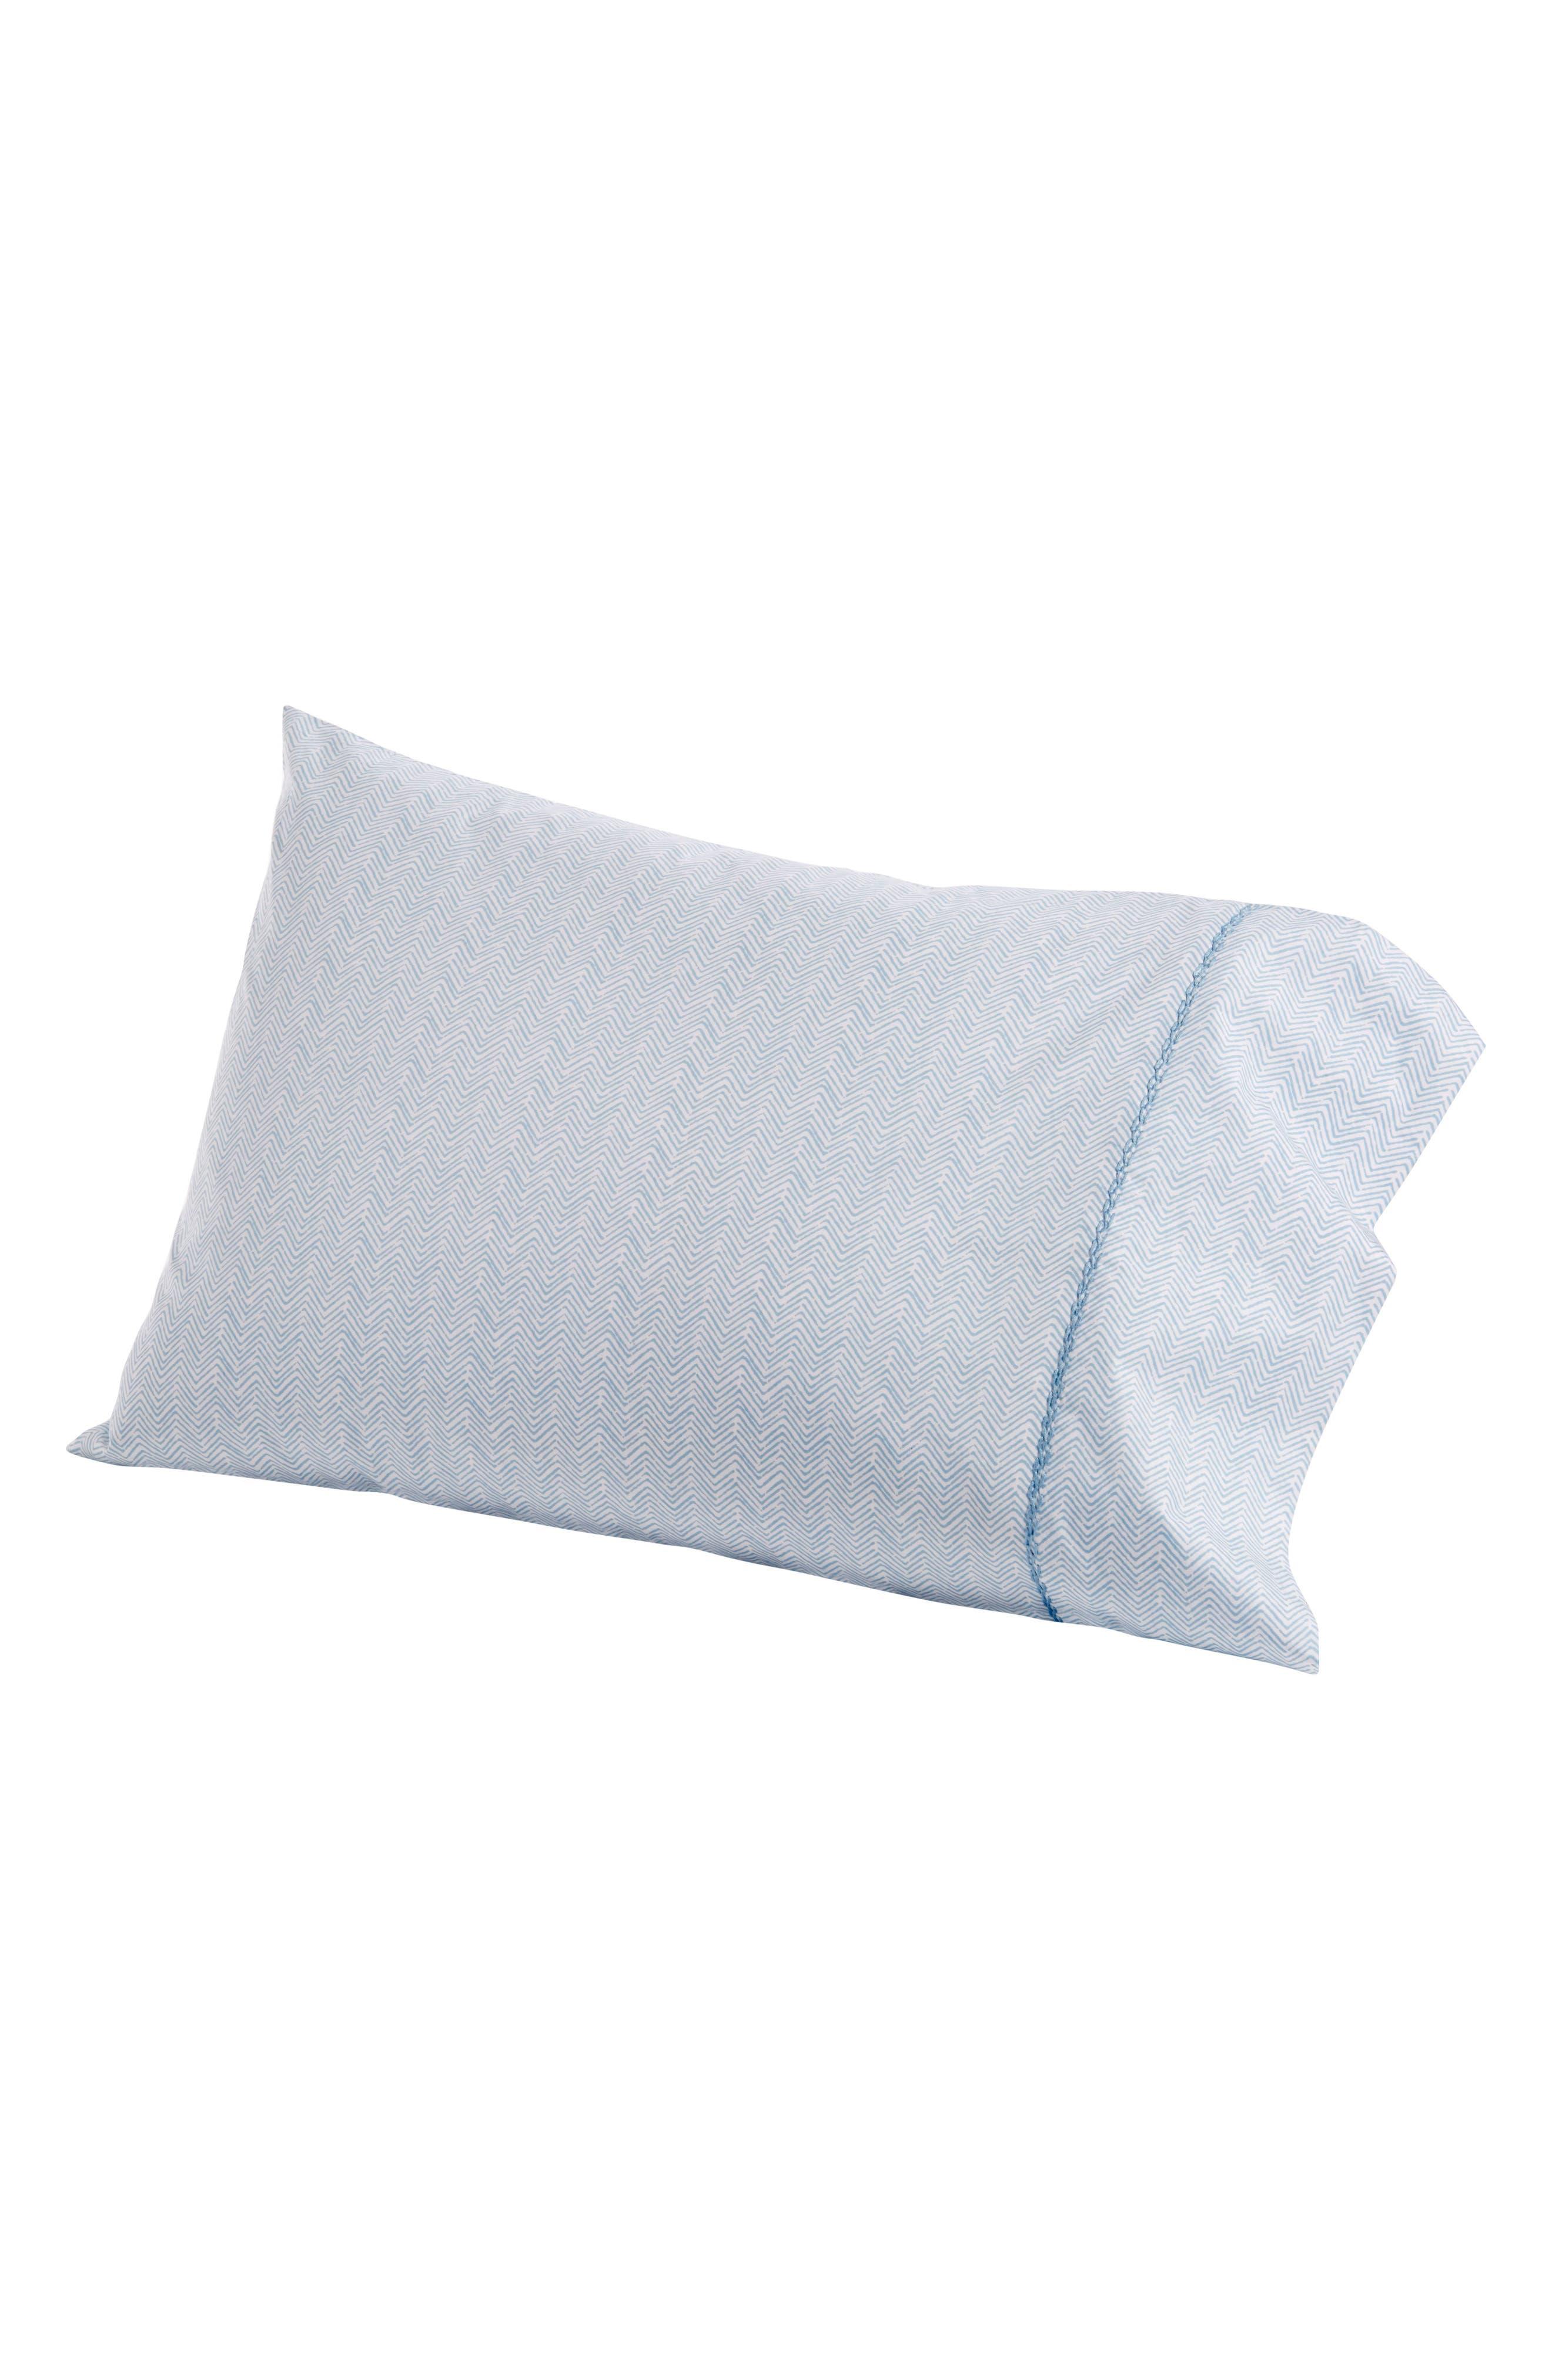 Chevron Combed Cotton Pillowcases,                             Main thumbnail 1, color,                             400